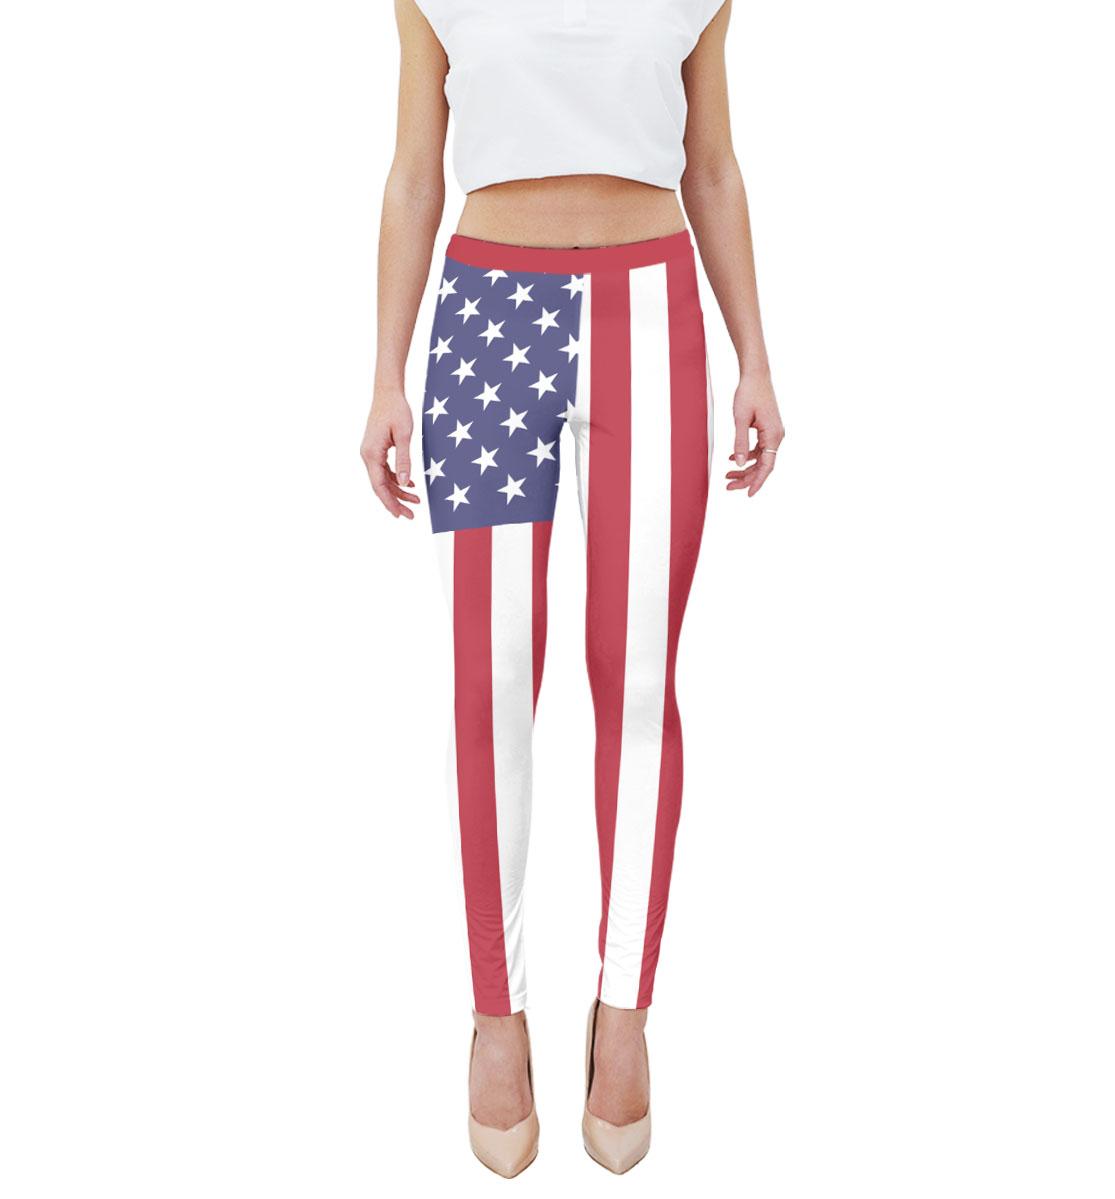 Купить Флаг США, Printbar, Леггинсы, NWT-692336-lgs-1